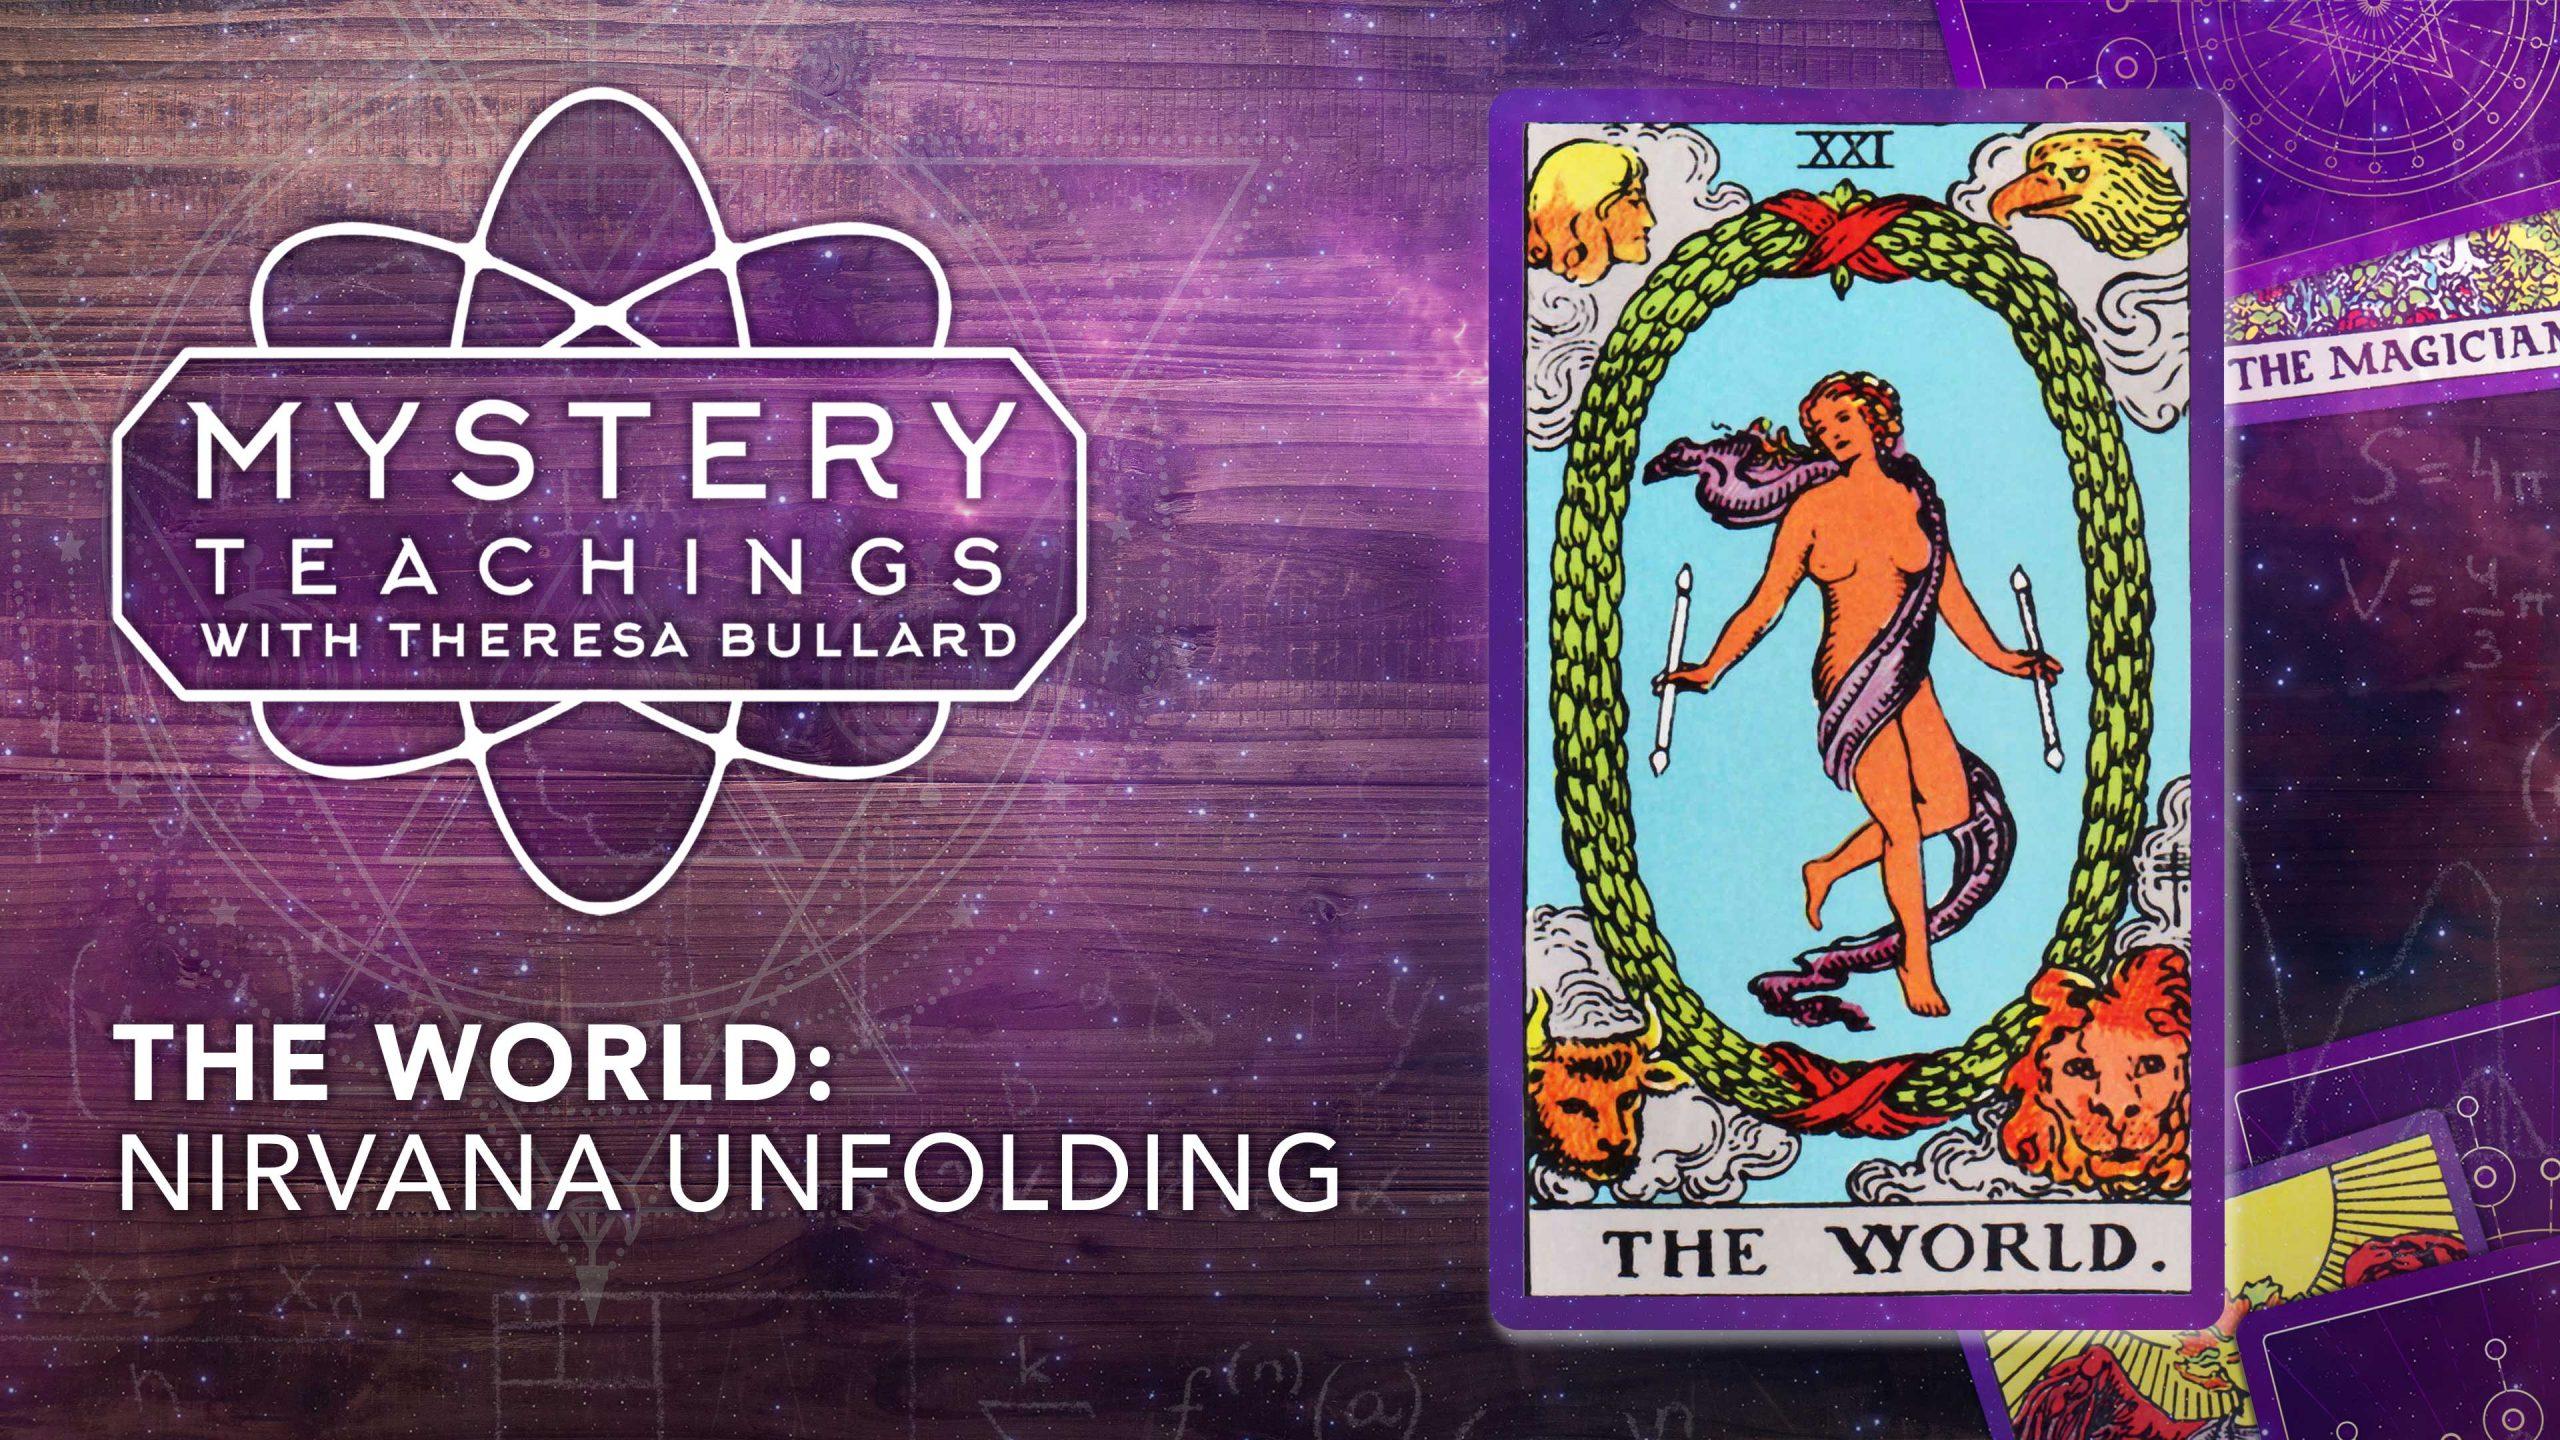 Mystery Teachings Season 4 on Gaia with Dr. Theresa Bullard